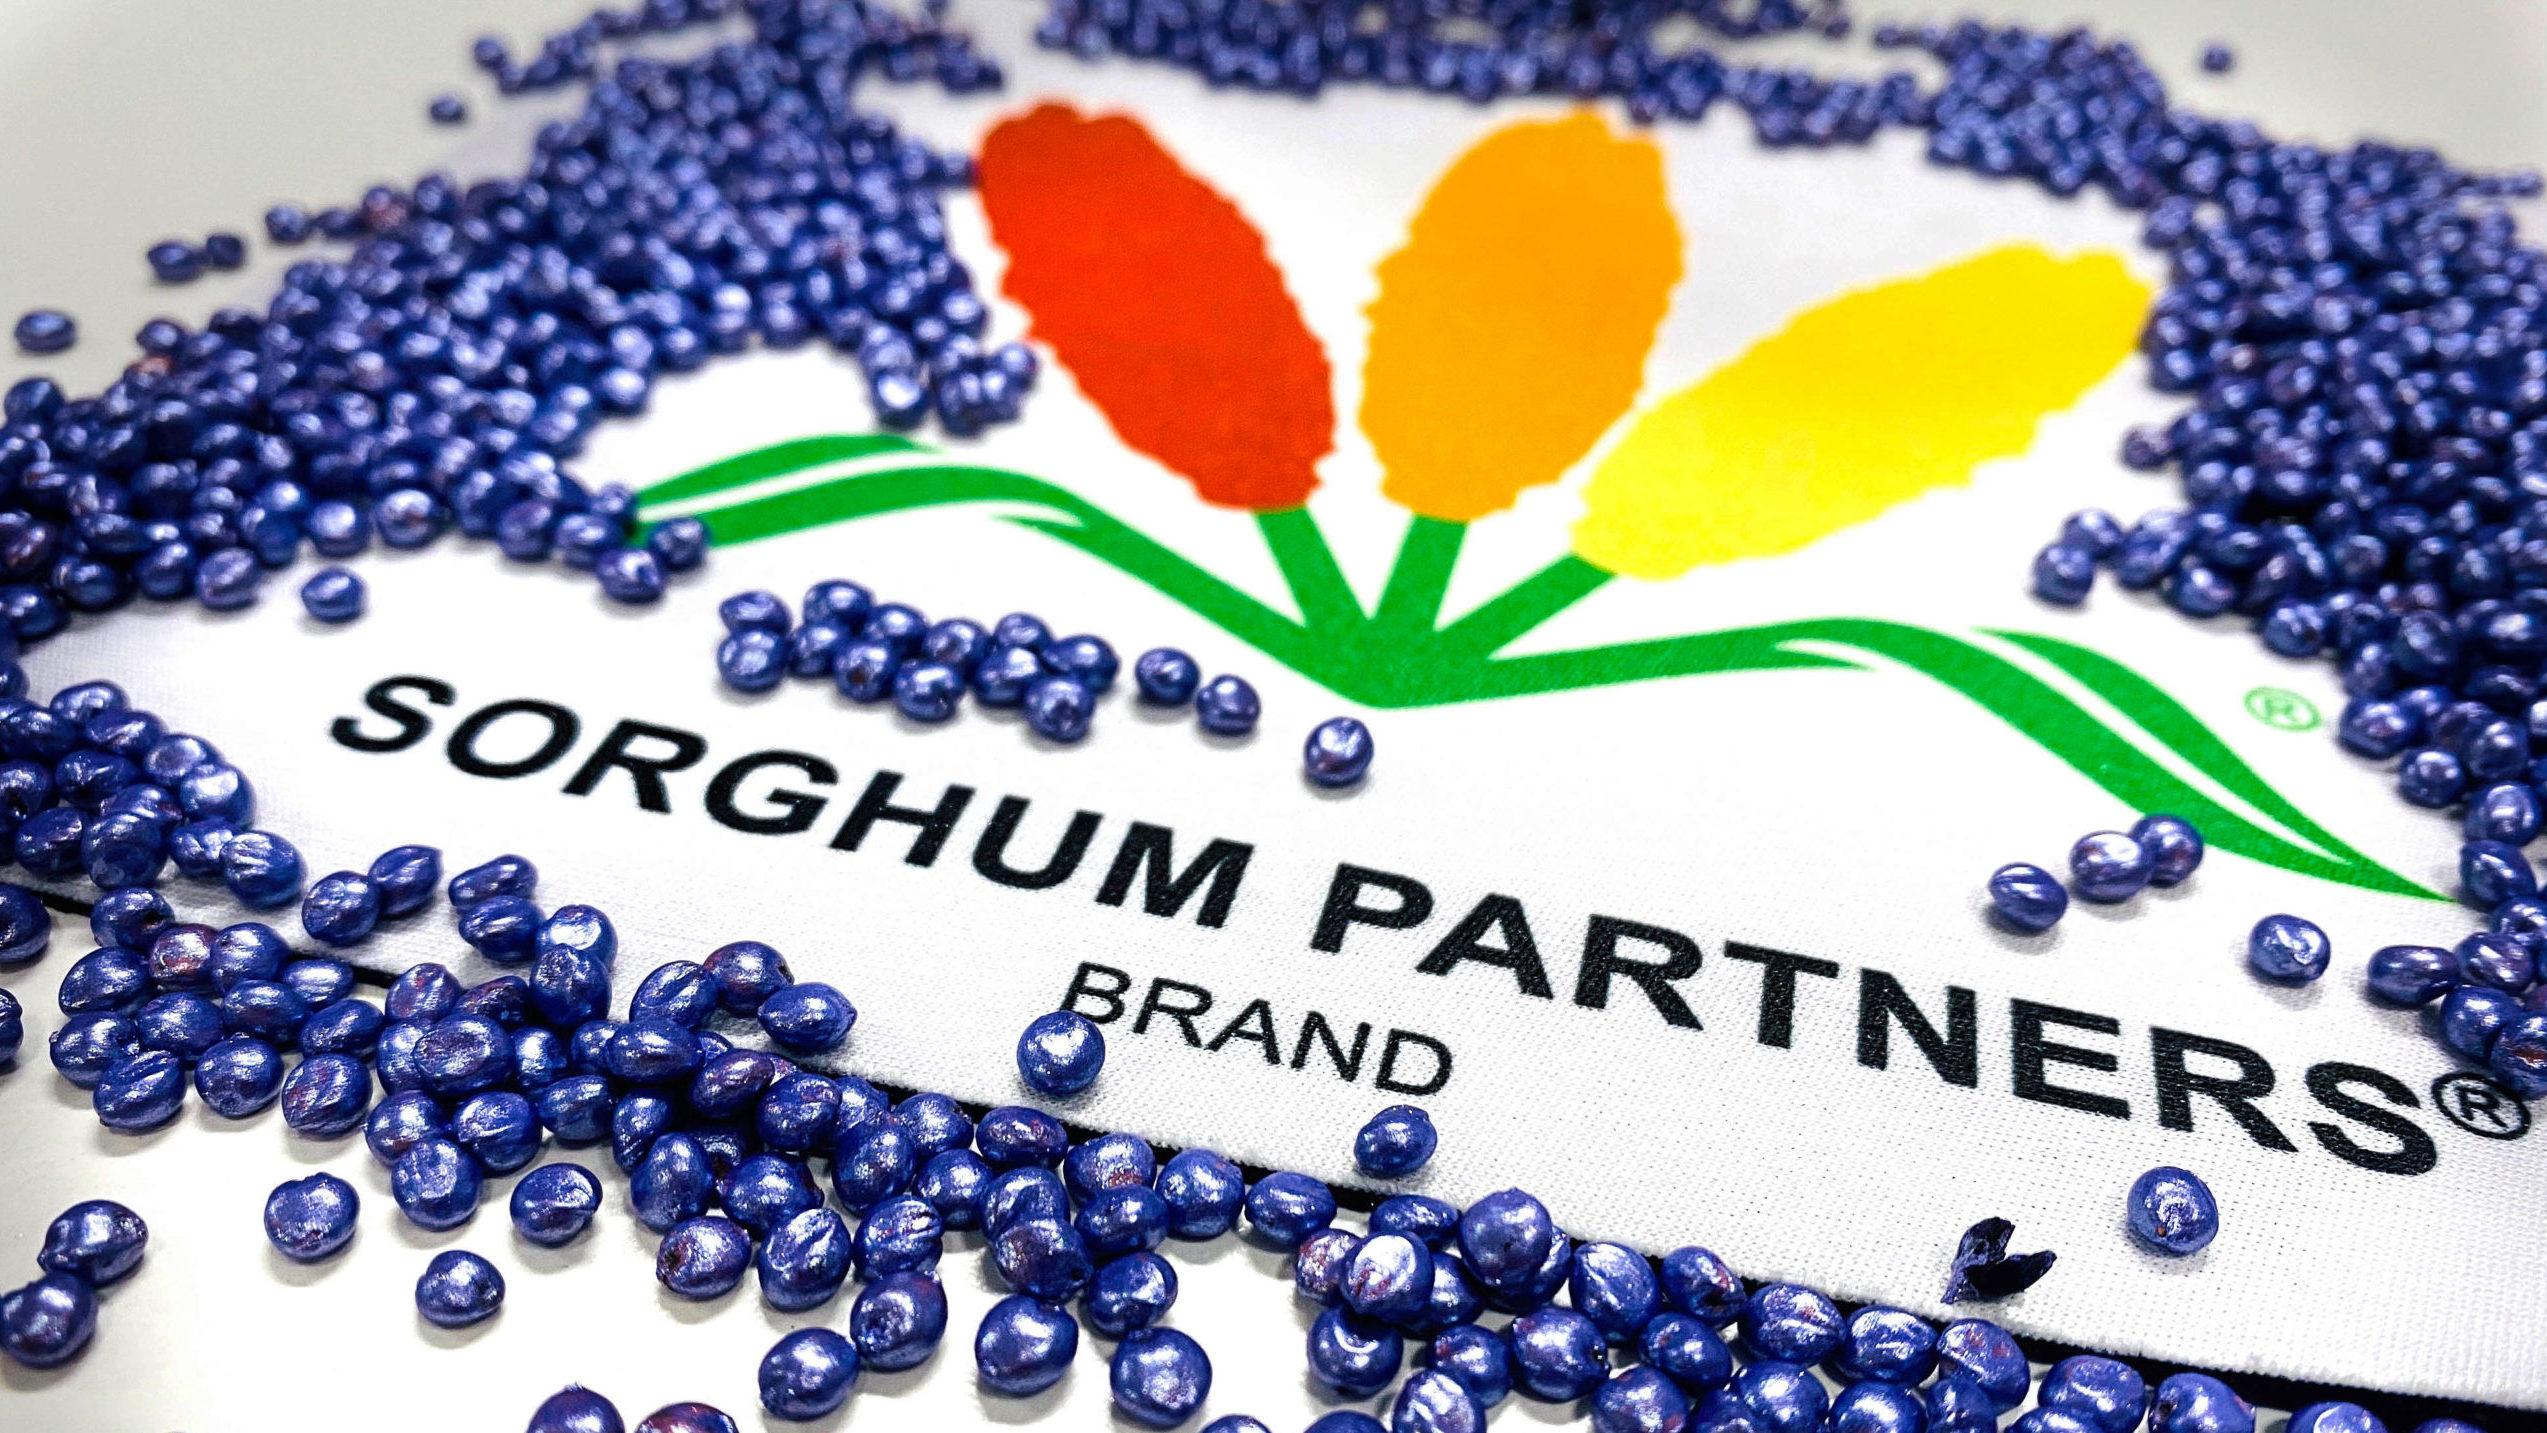 Sorghum seed treatment